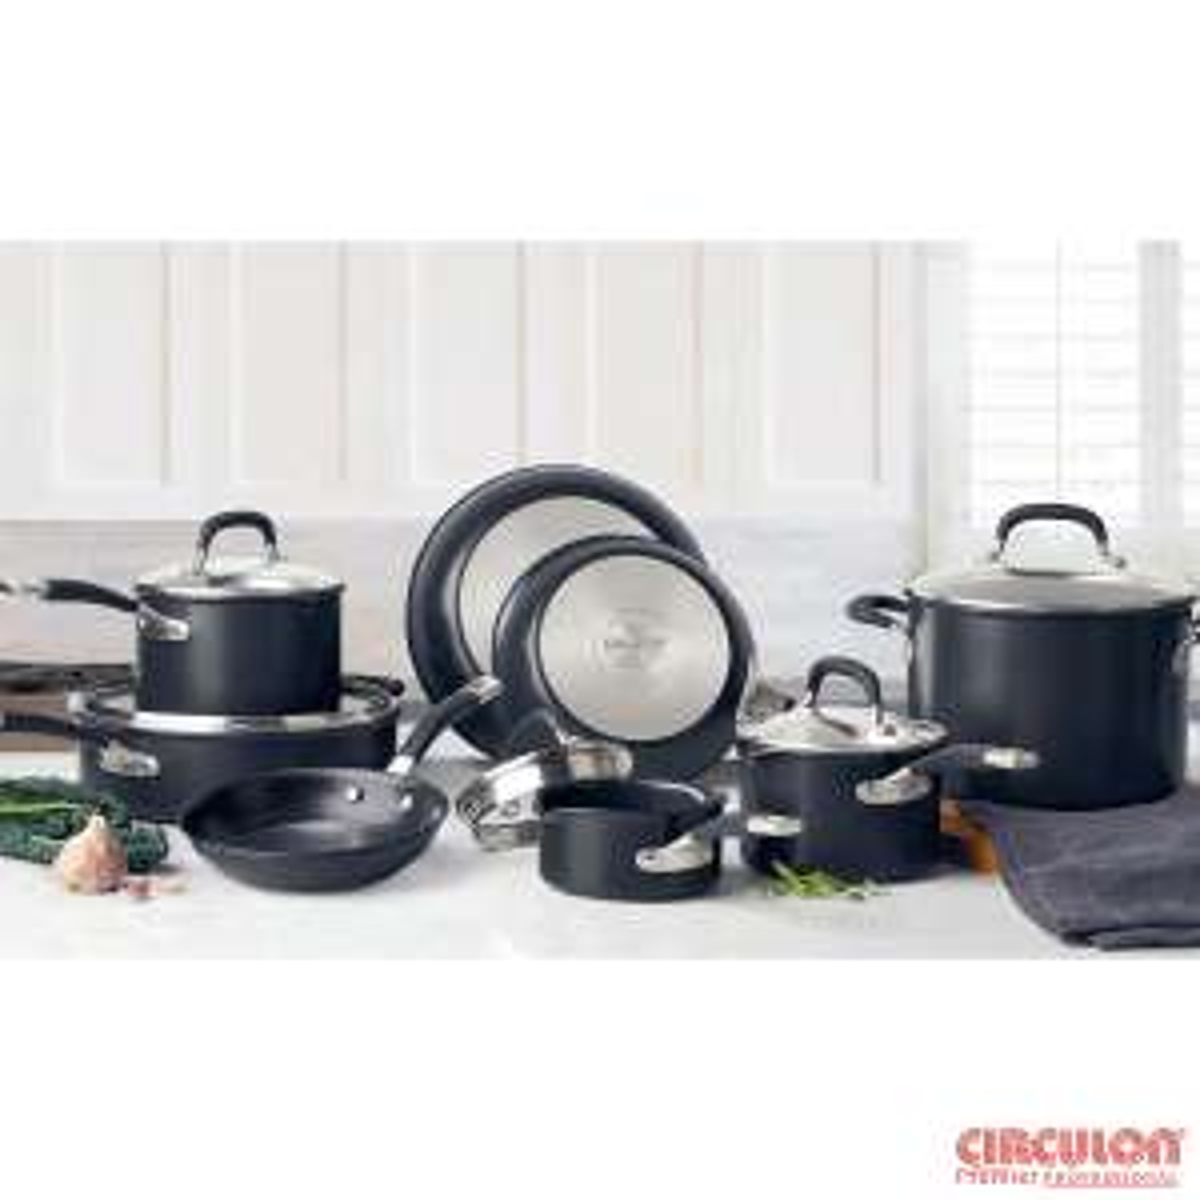 Black Circulon Premier Induction 13 piece set now @ Costco - £197.89